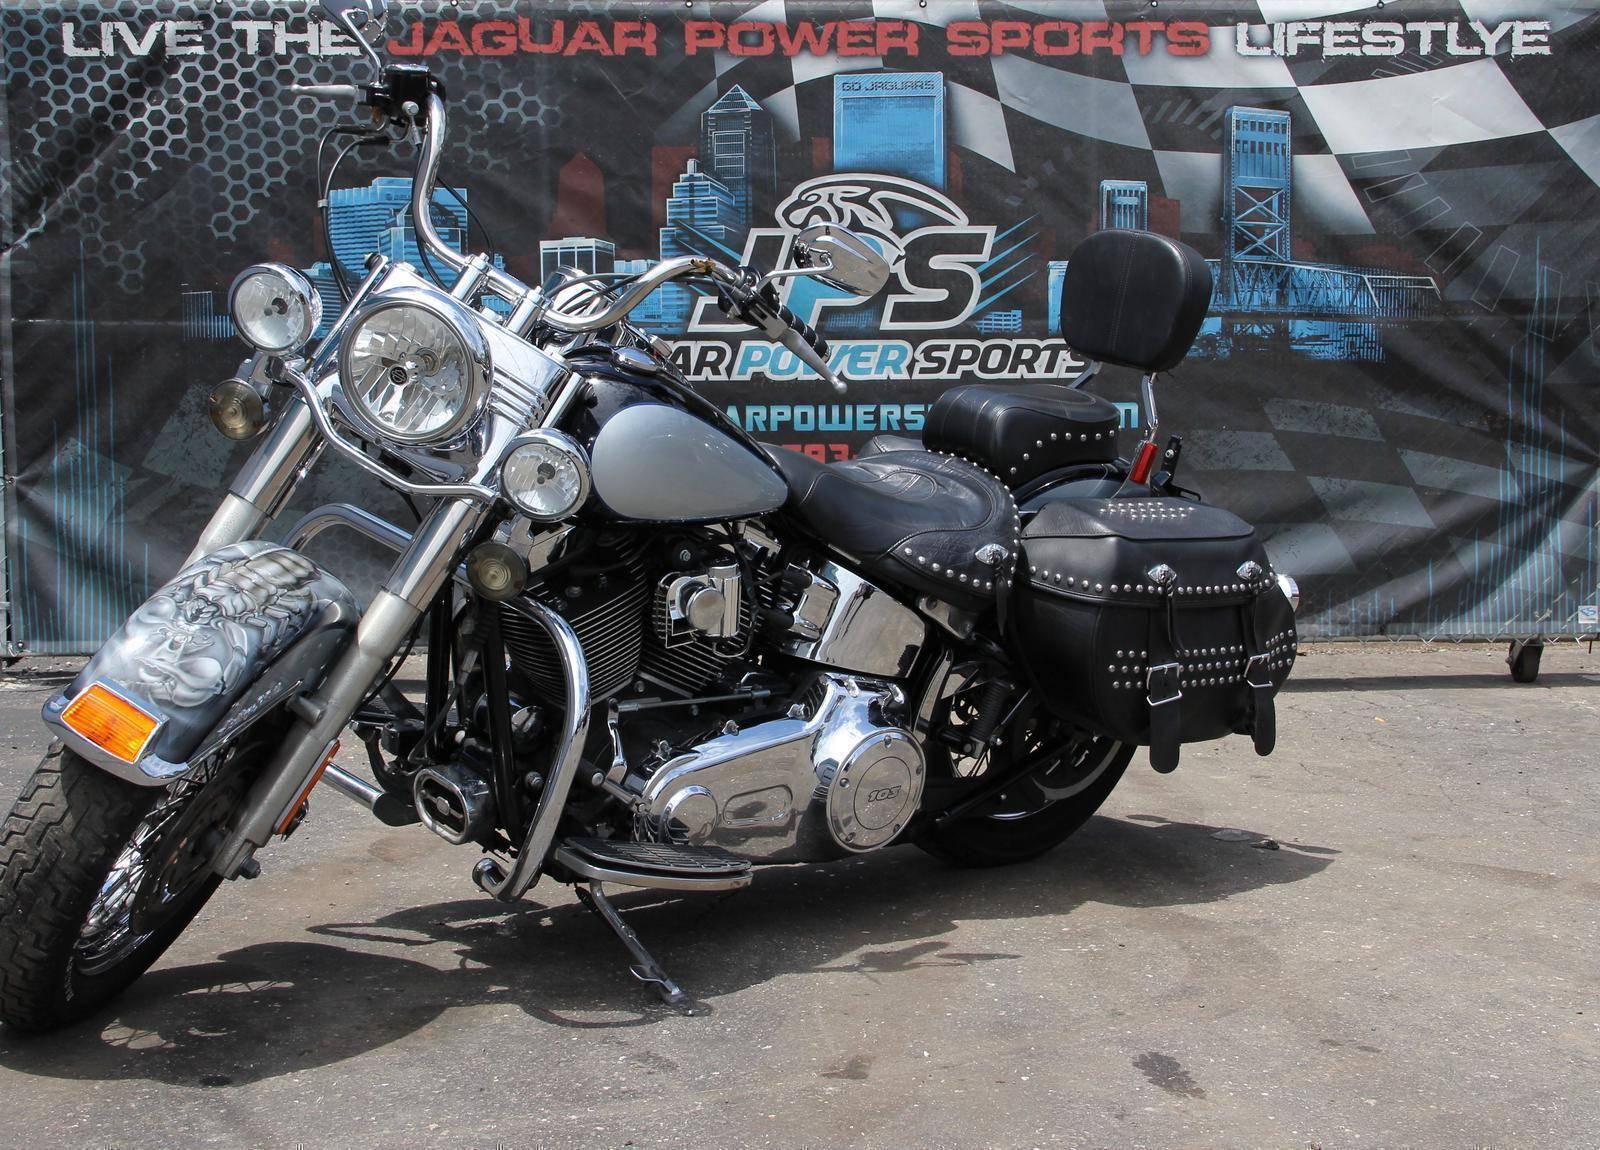 Used 2012 Harley-Davidson FLSTC103 Motorcycles in Jacksonville, FL